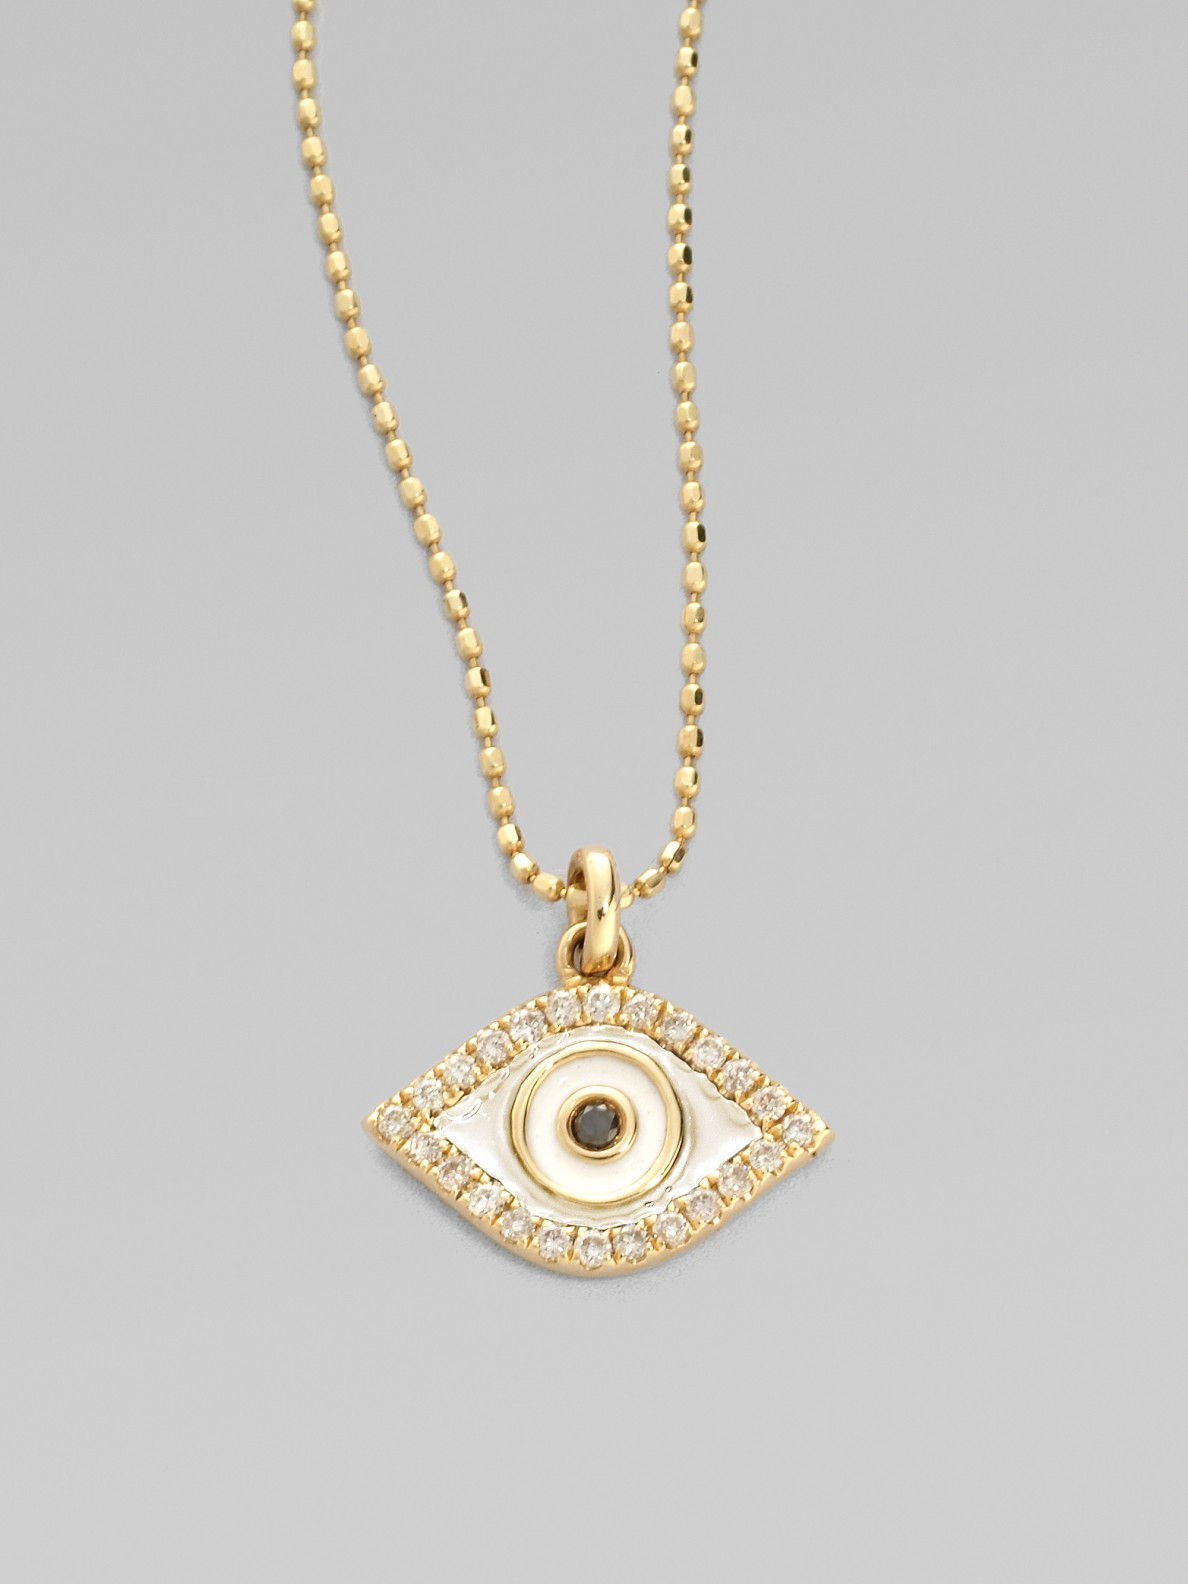 Sydney Evan 14k Gold Evil Eye Necklace with Single Diamond B4Idbnre3